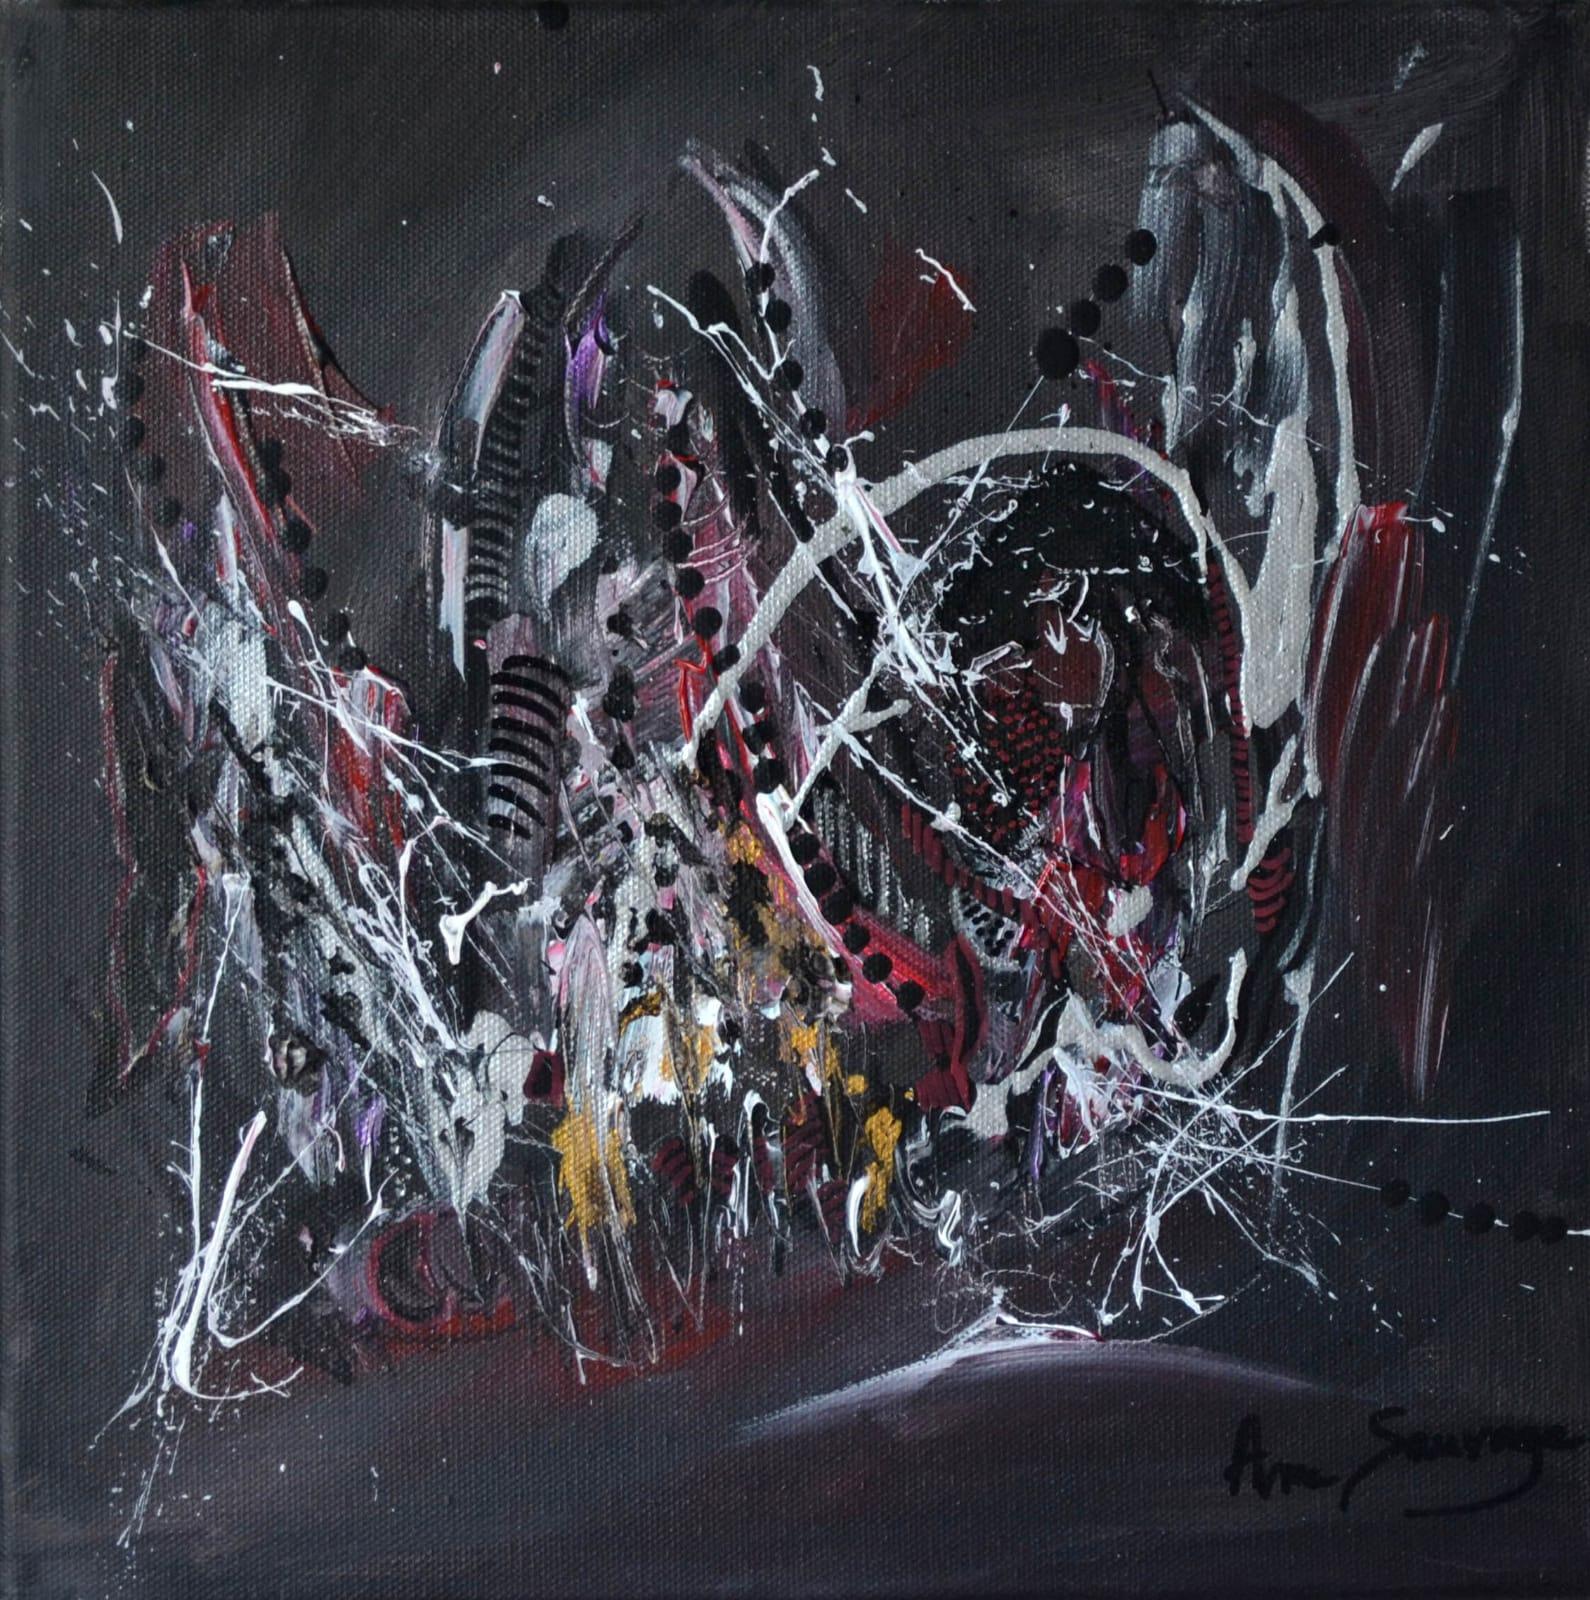 Peinture Abstraite Moderne Noir Et Blanc Ame Sauvage